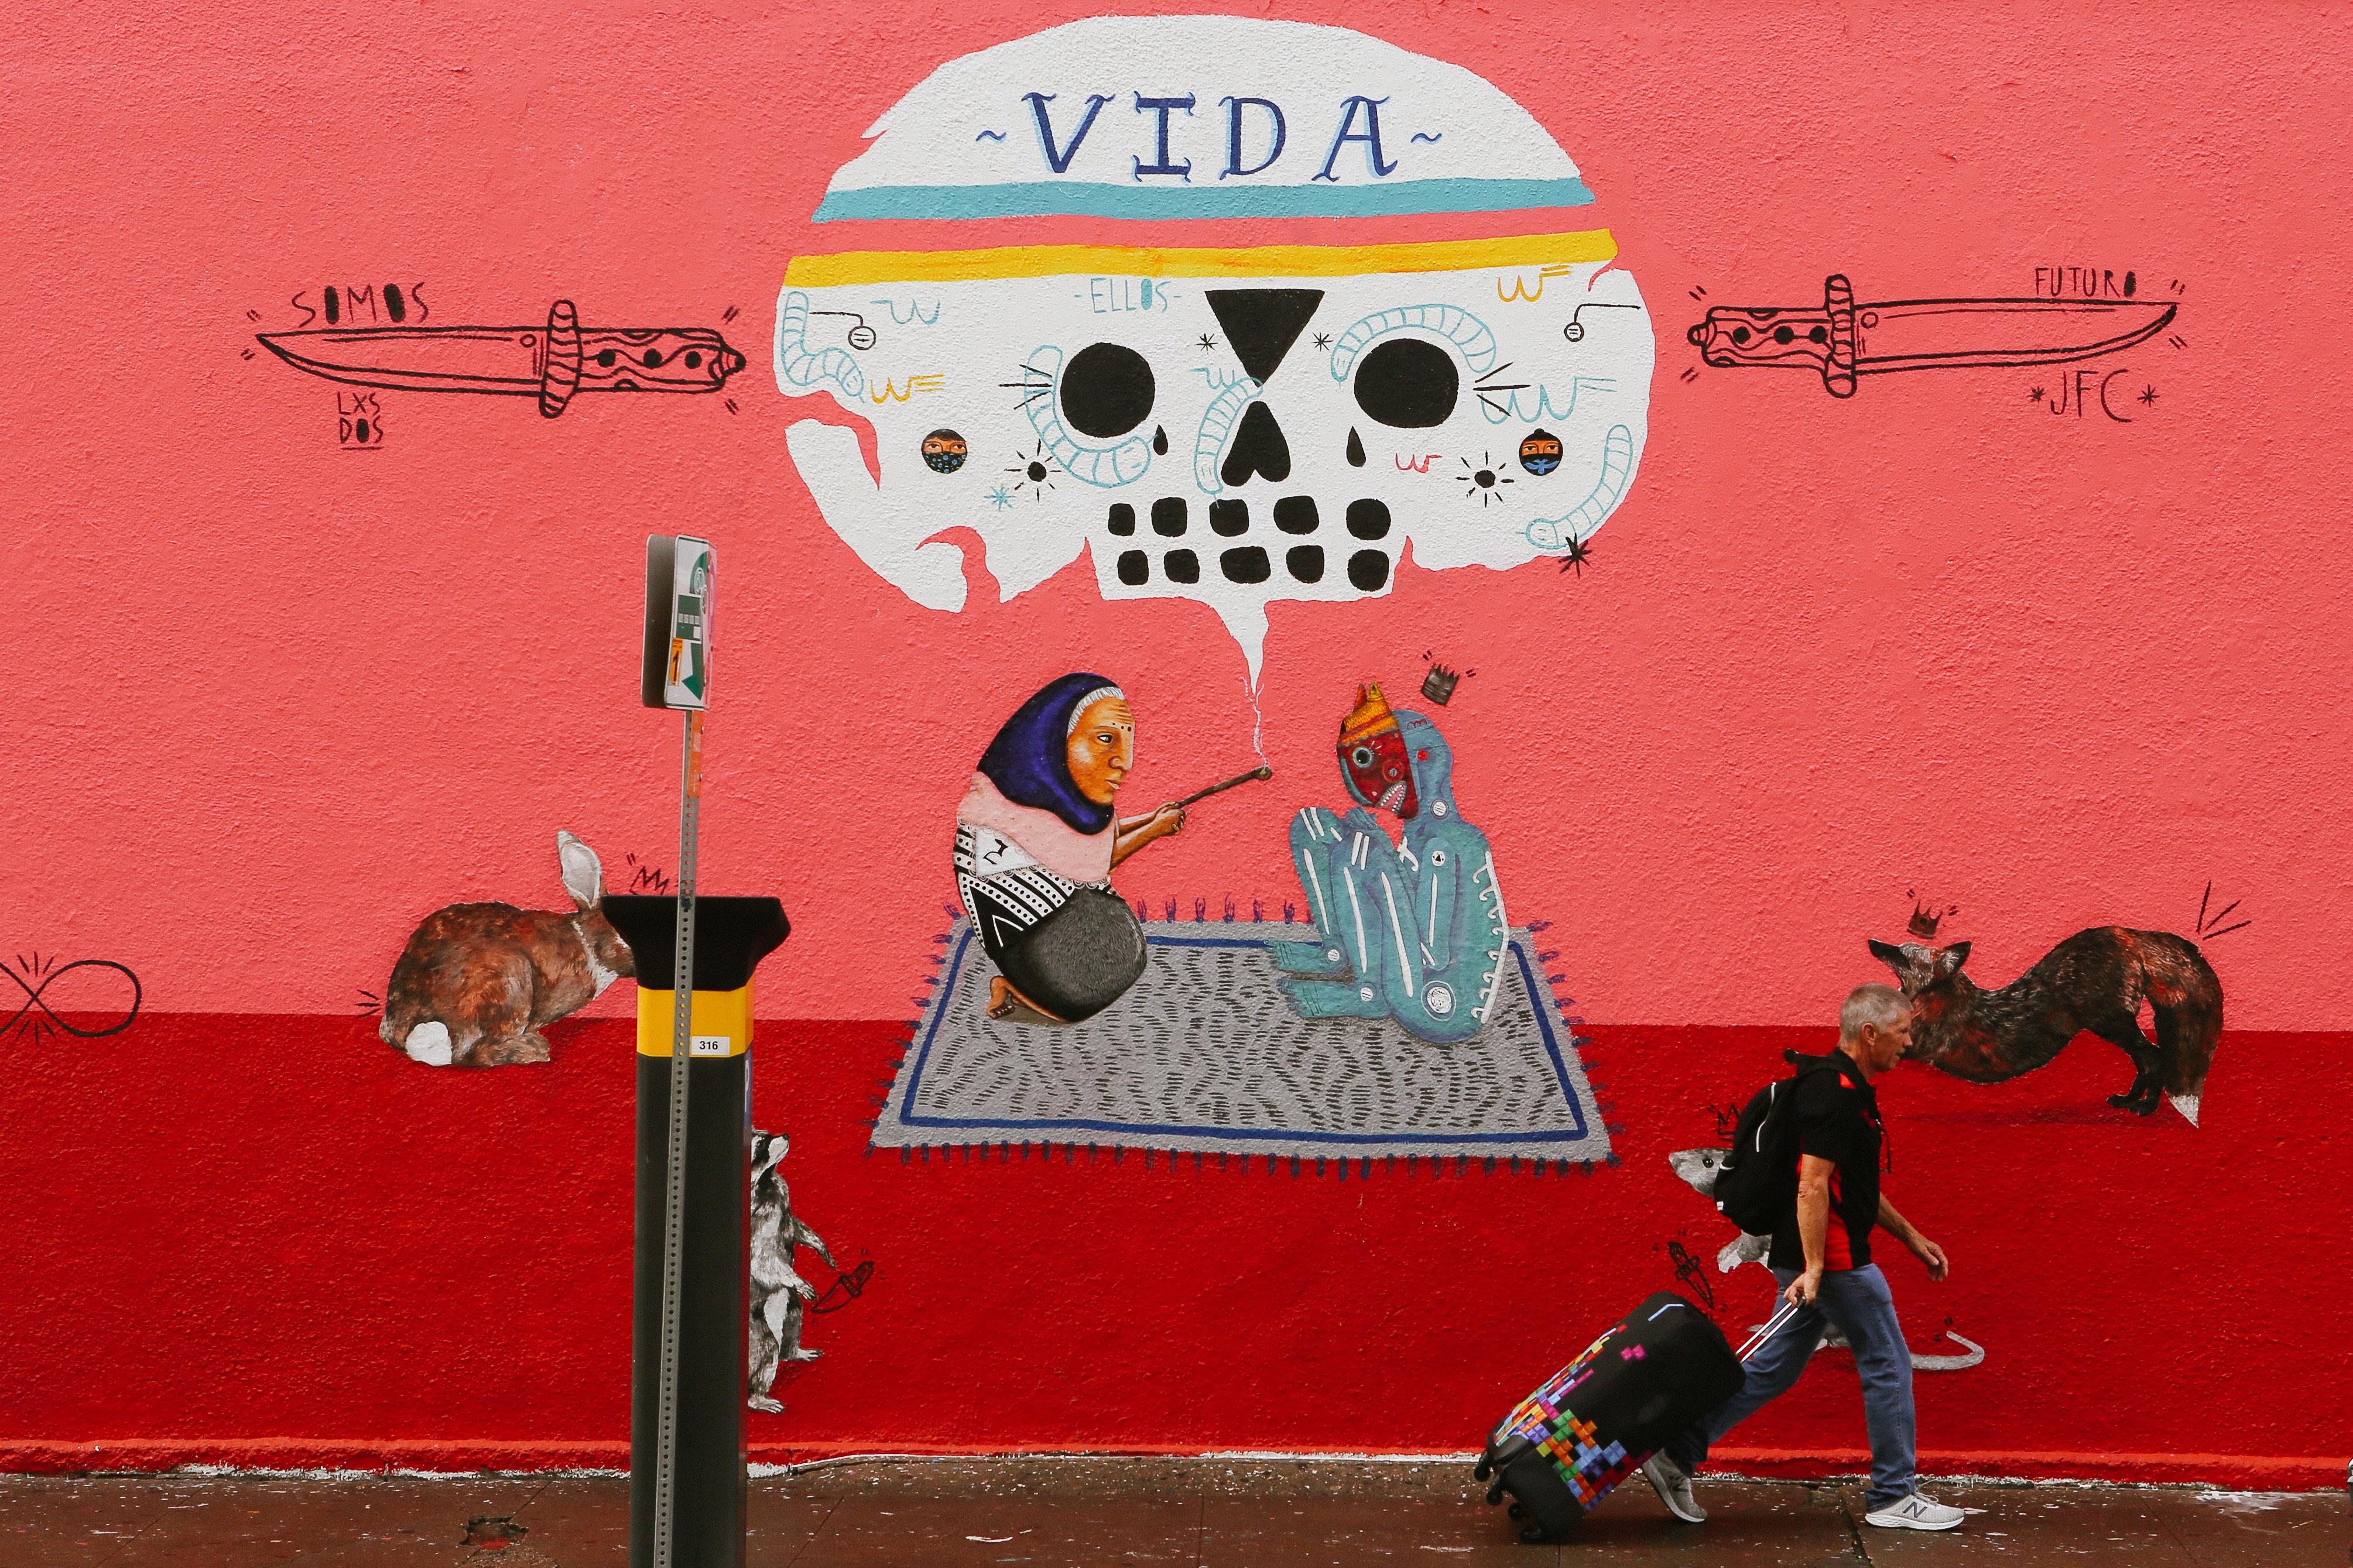 Austin Texas Vida Wall Mural Art